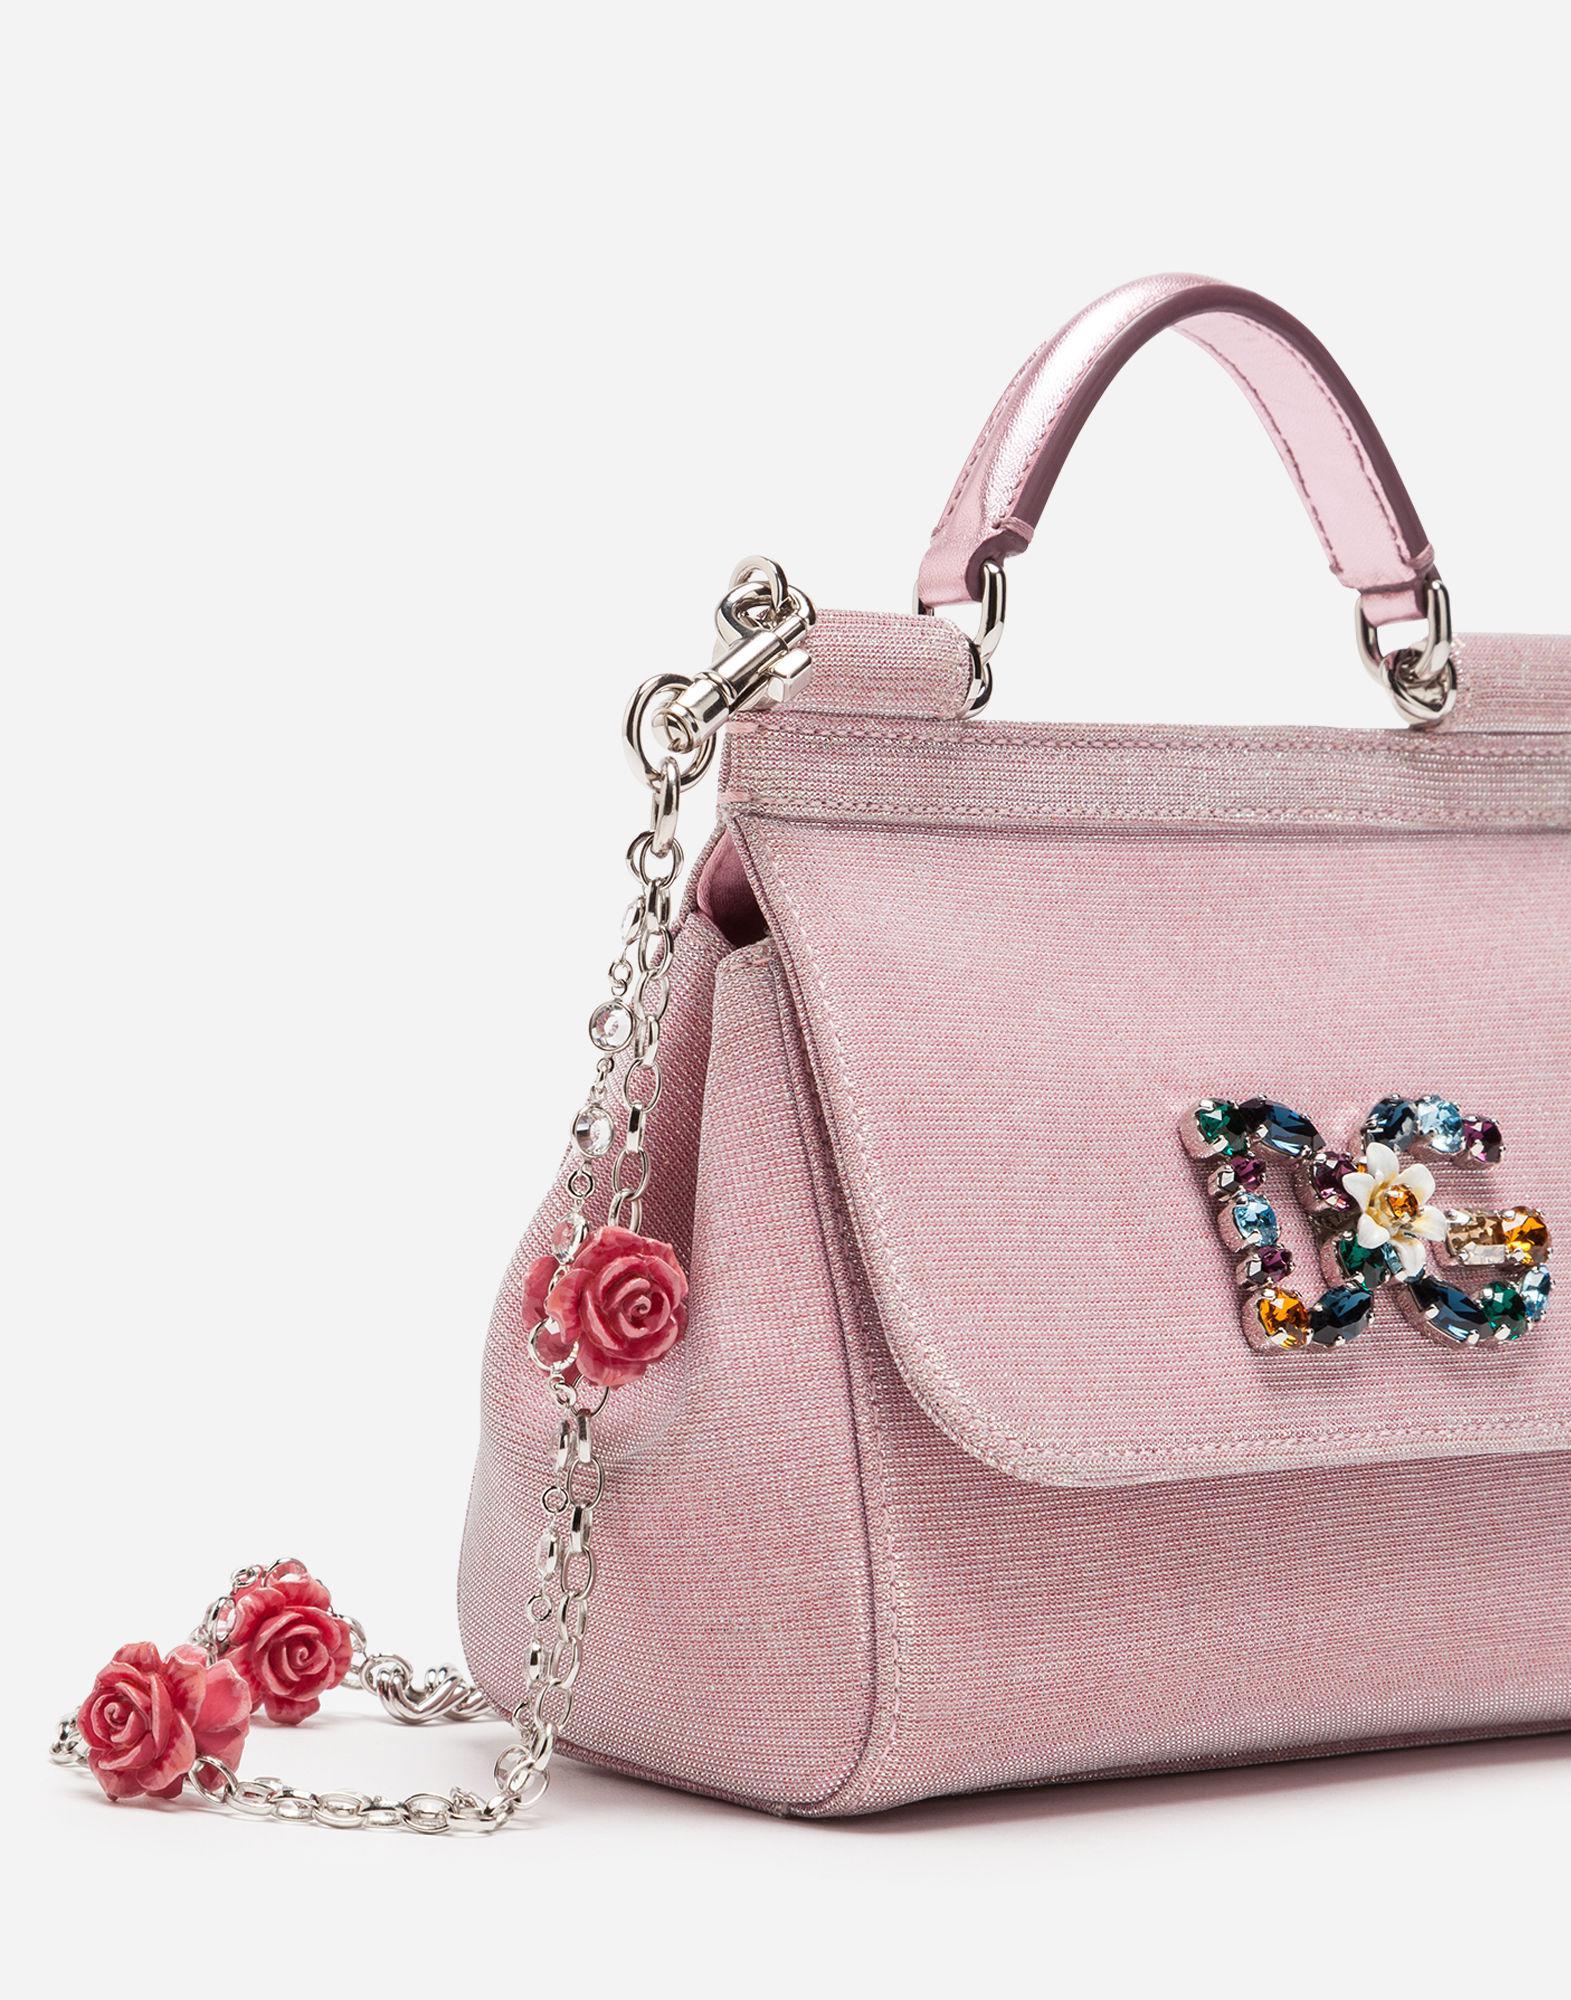 0d222ae70eb3 Women s Pink Mini Sicily Bag In Lurex Fabric